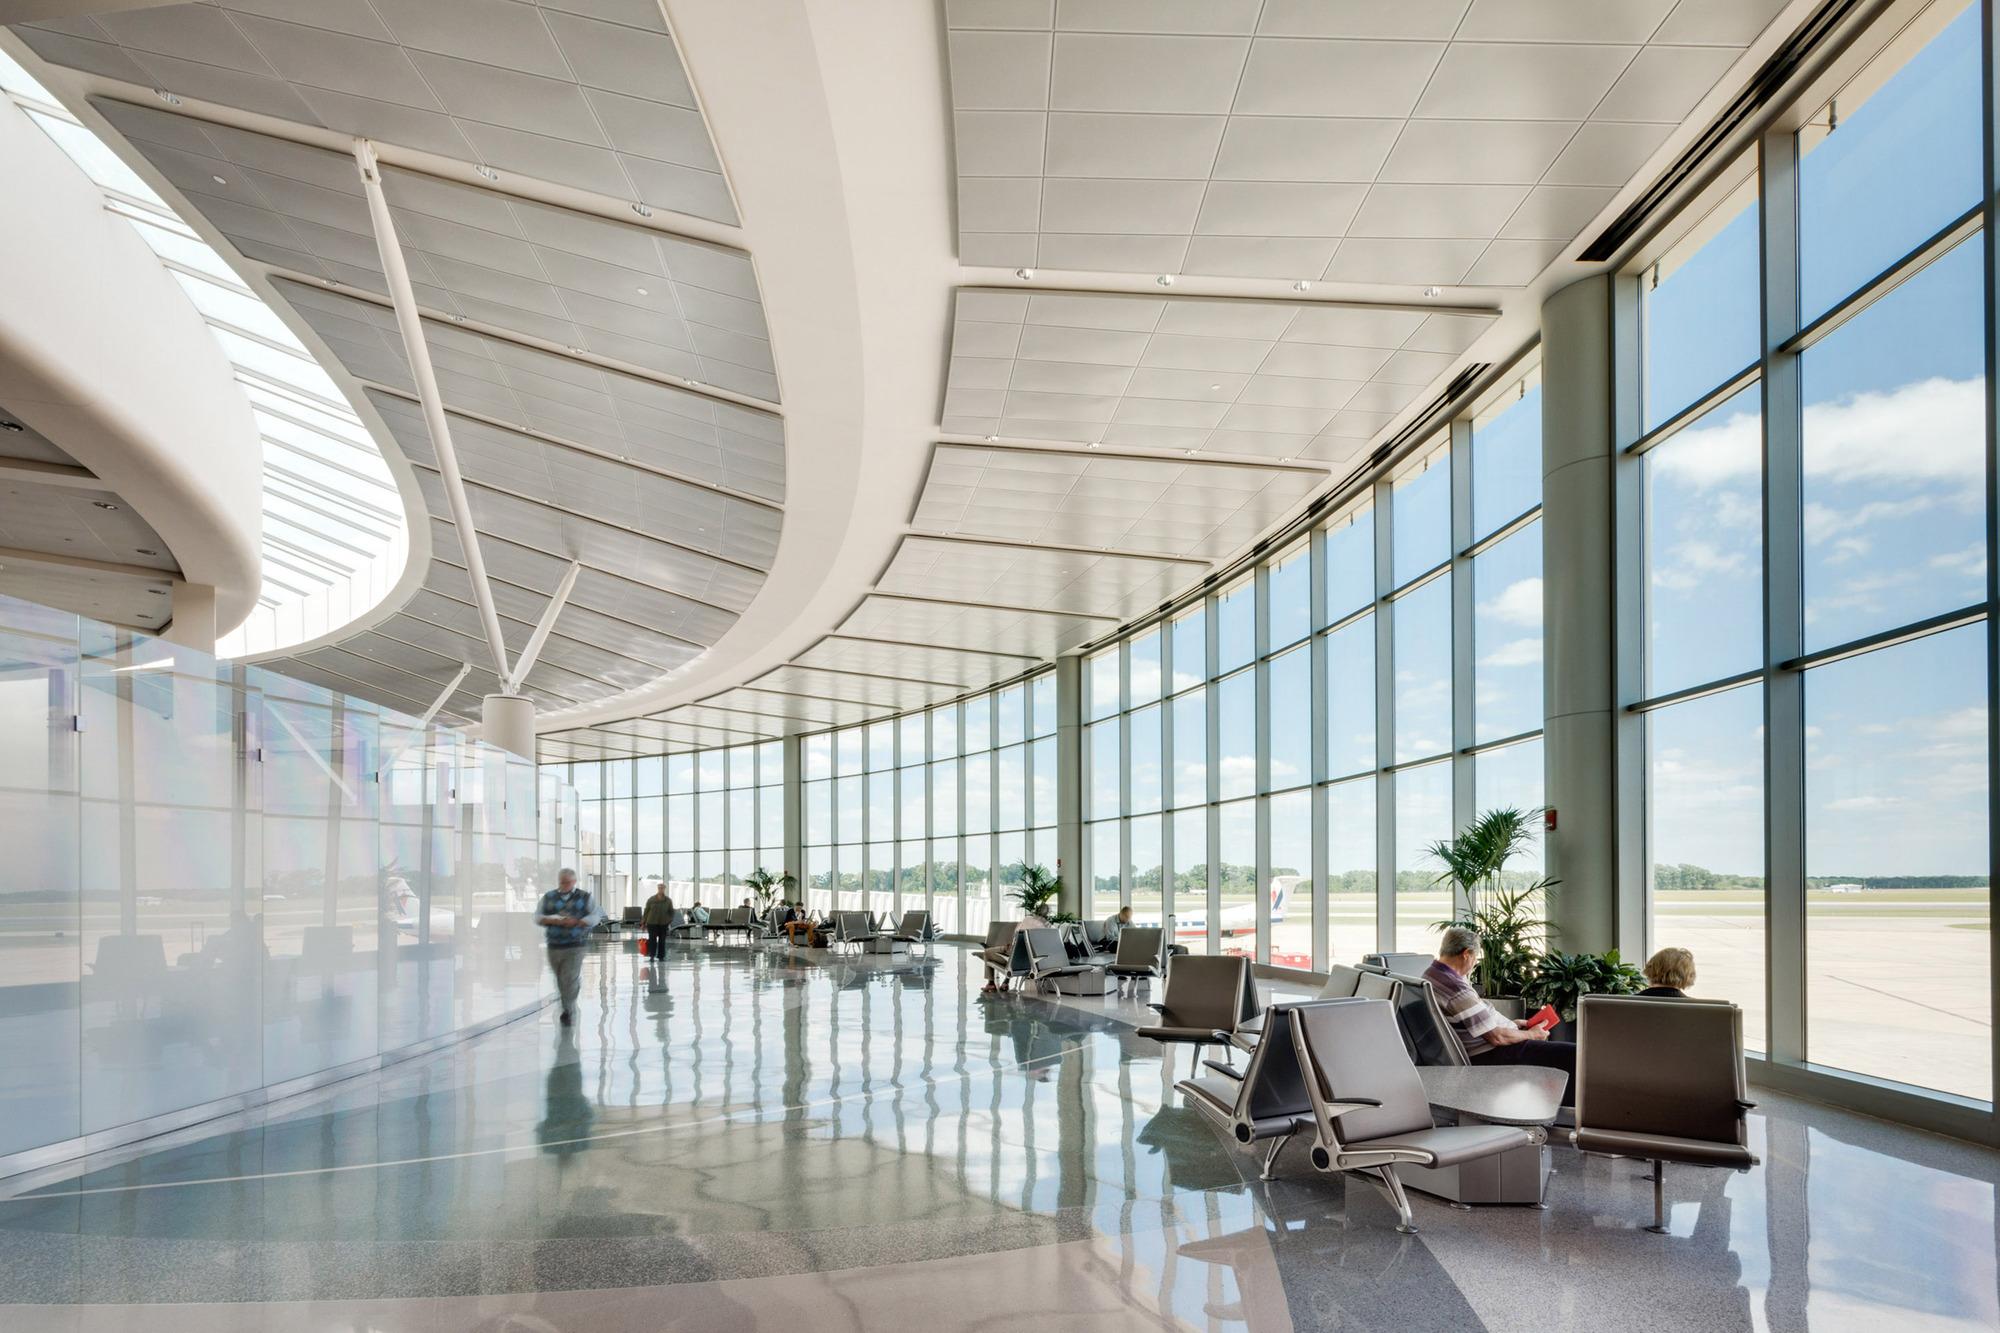 Baton Rouge Metropolitan Airport Extension Whlc